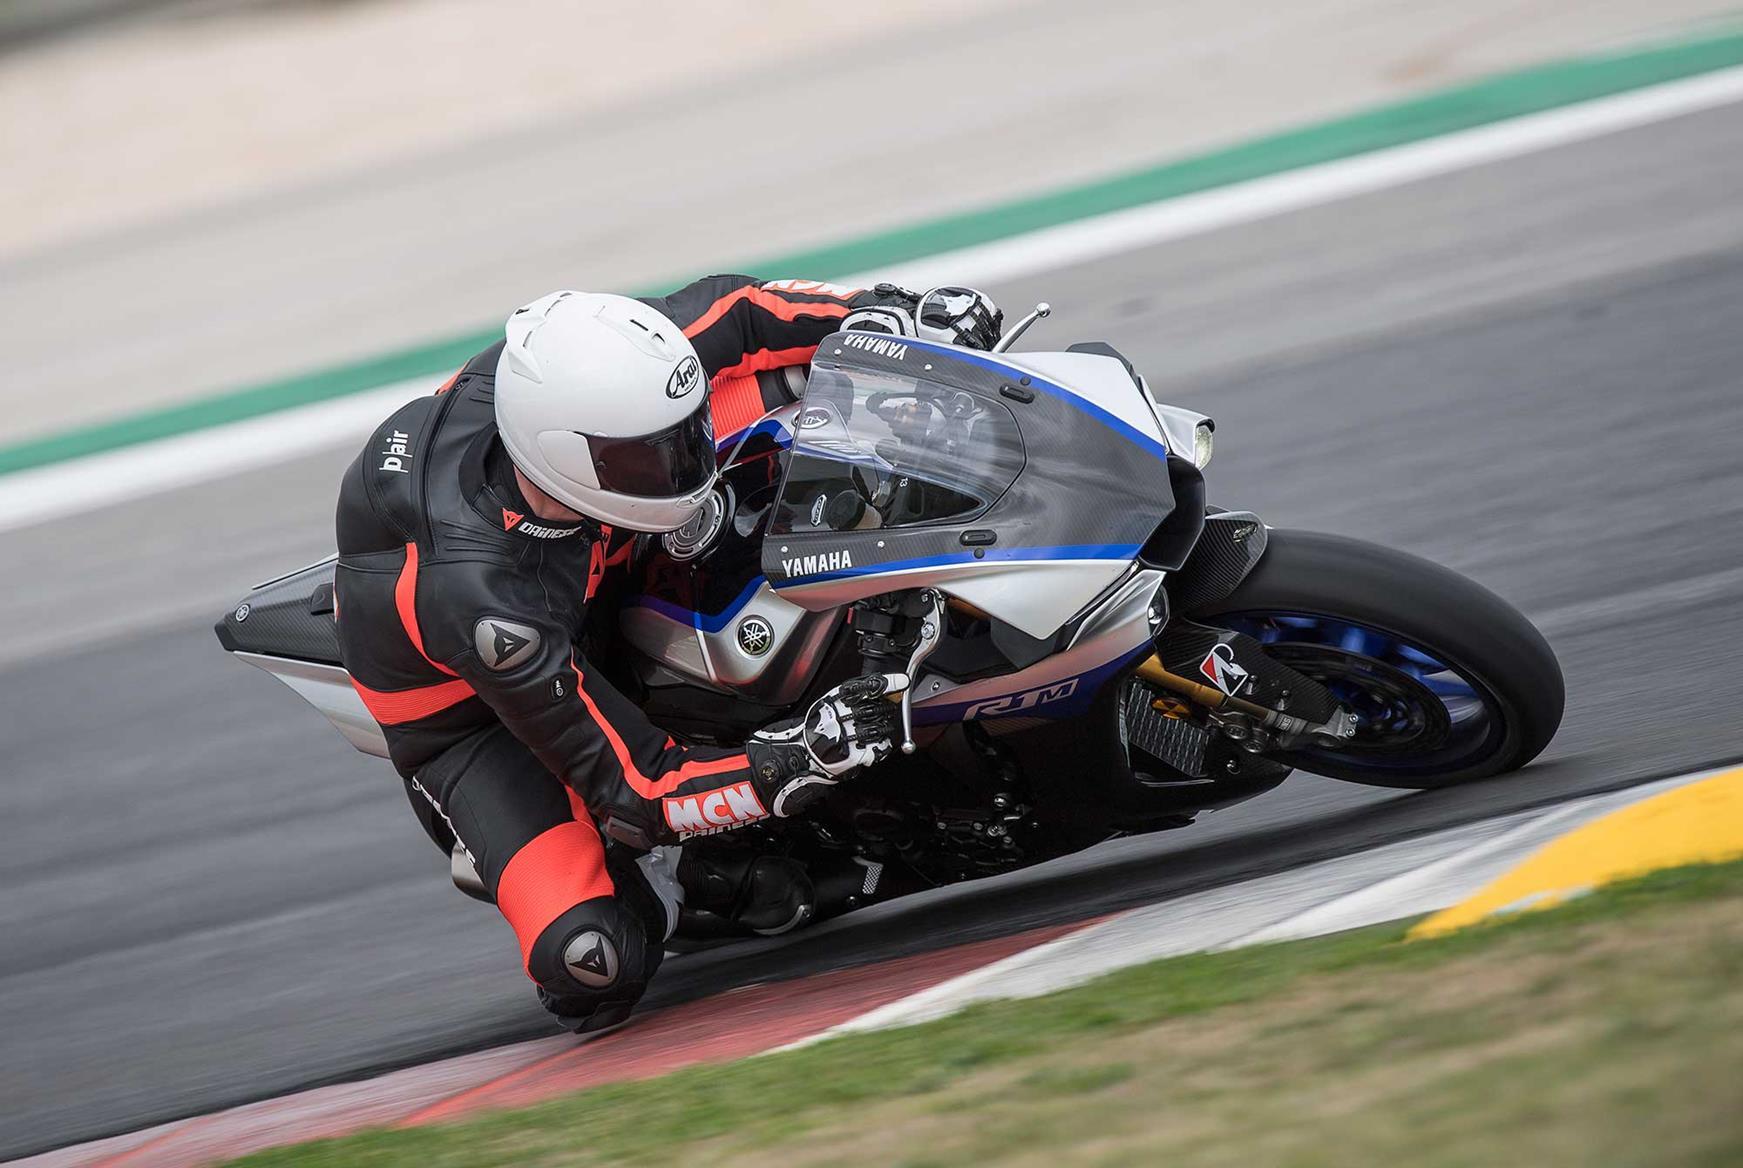 Yamaha R1M on track